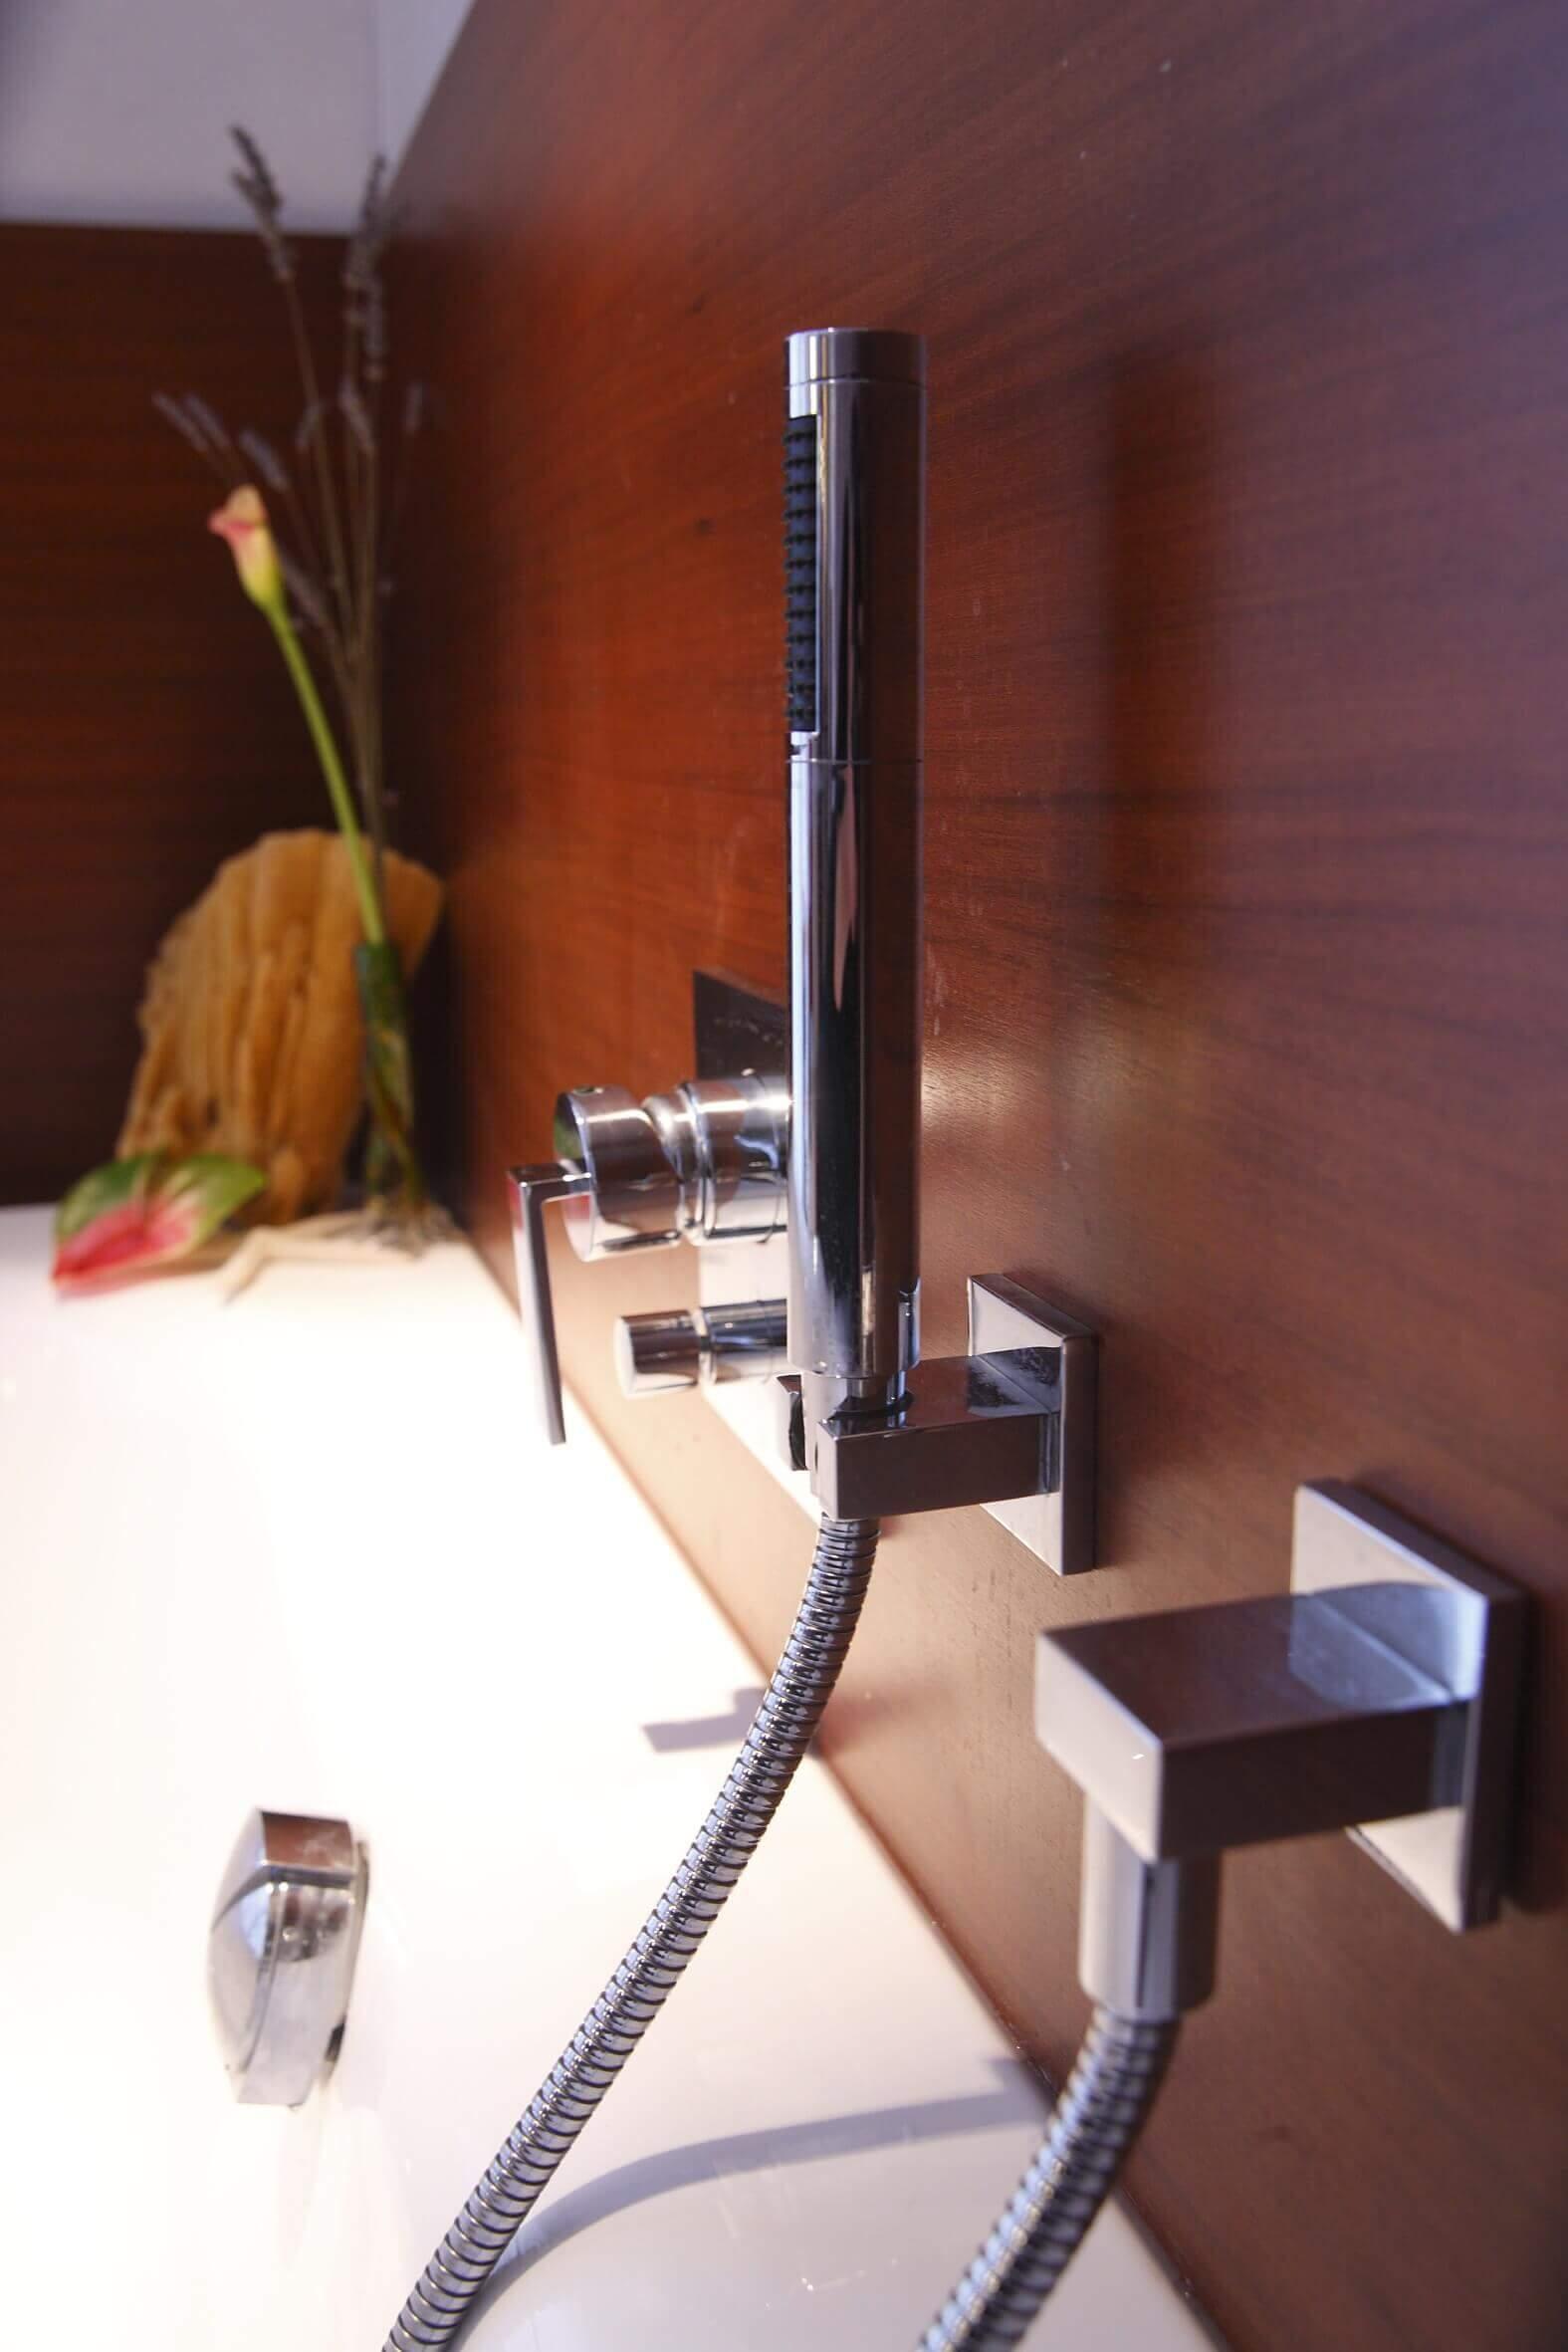 luxuri ser ruhepol im bonner villenviertel lifestyle. Black Bedroom Furniture Sets. Home Design Ideas